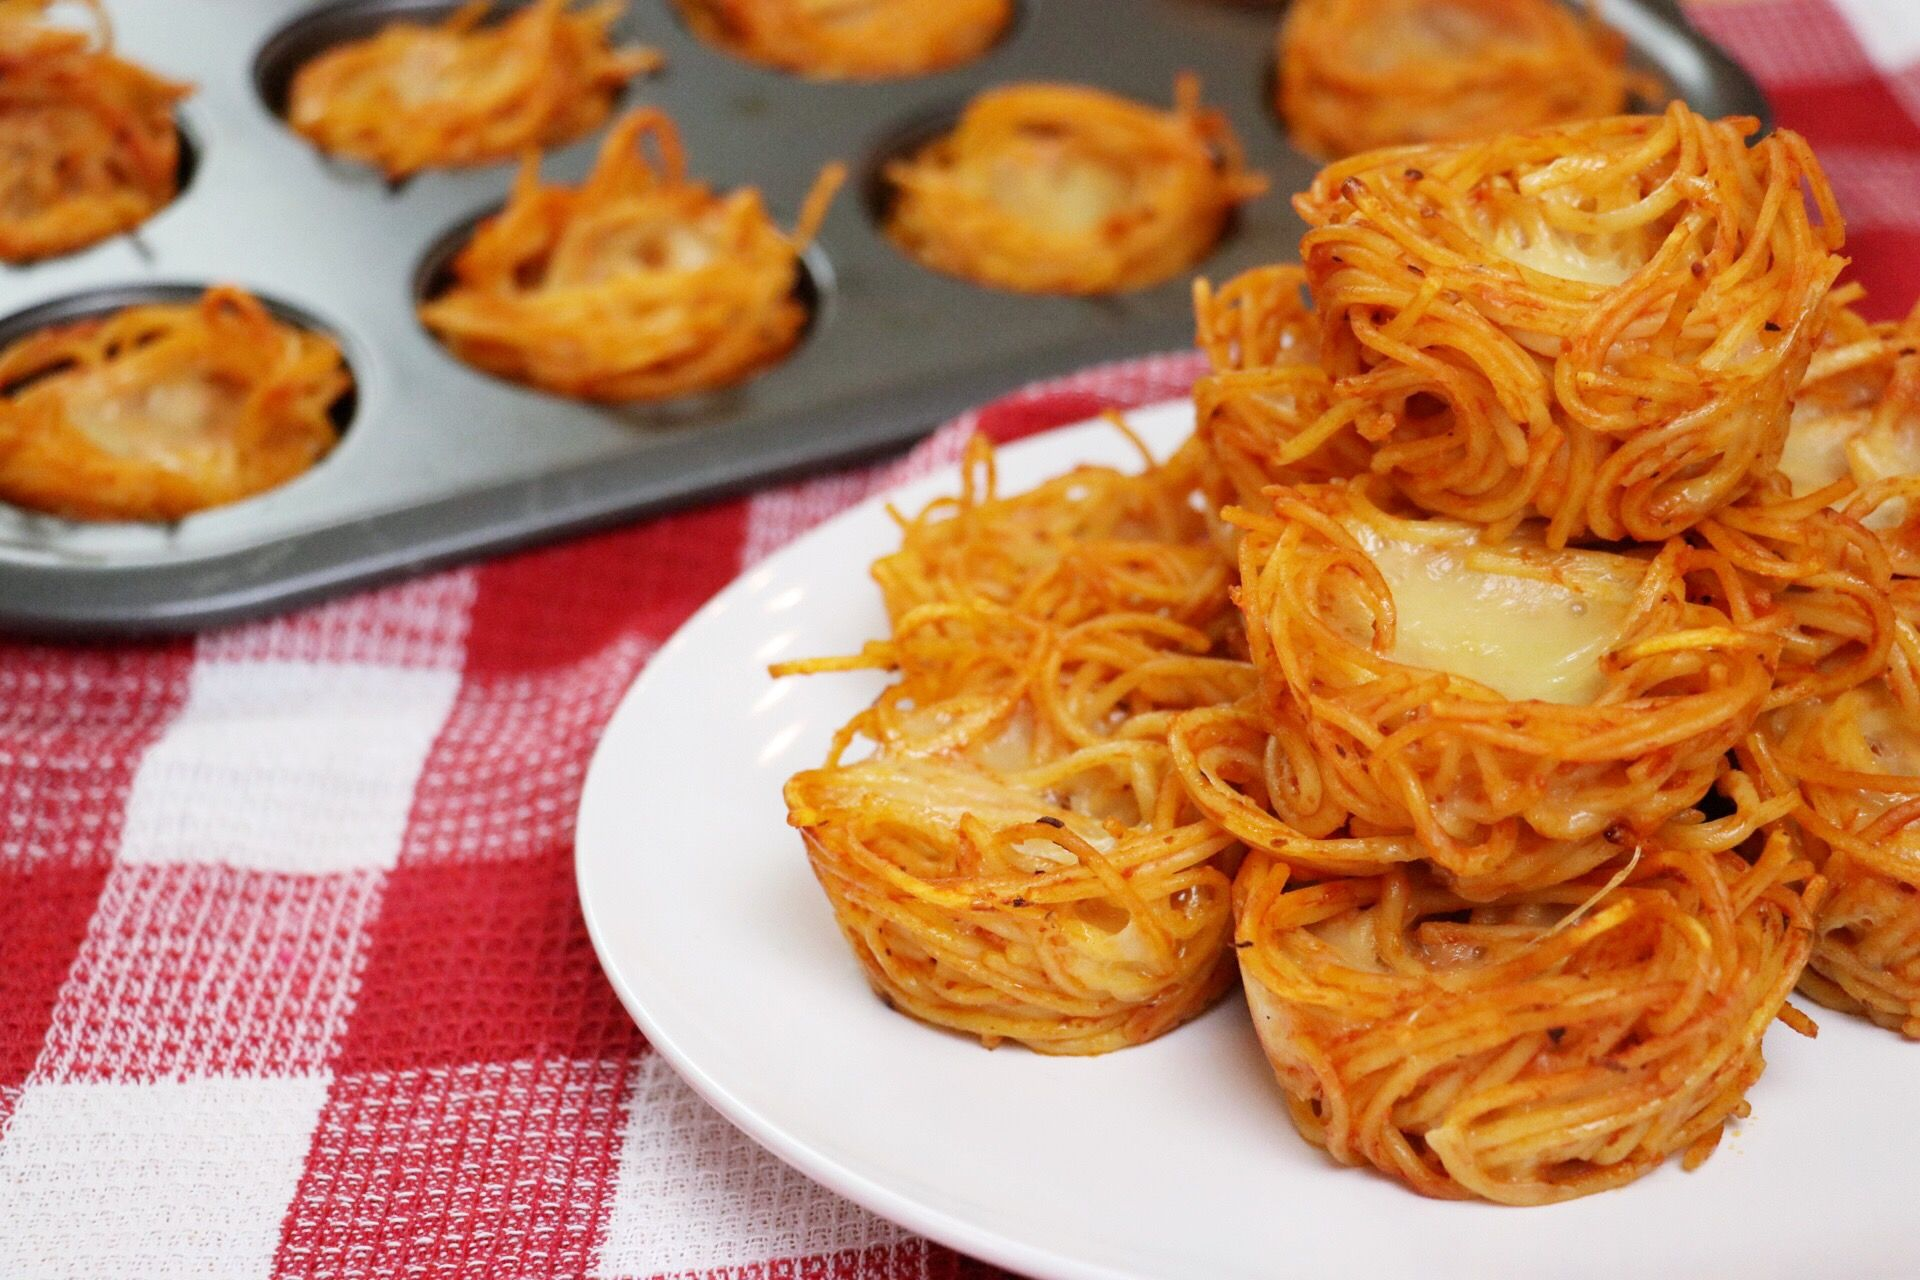 Leftover Spaghetti Nests